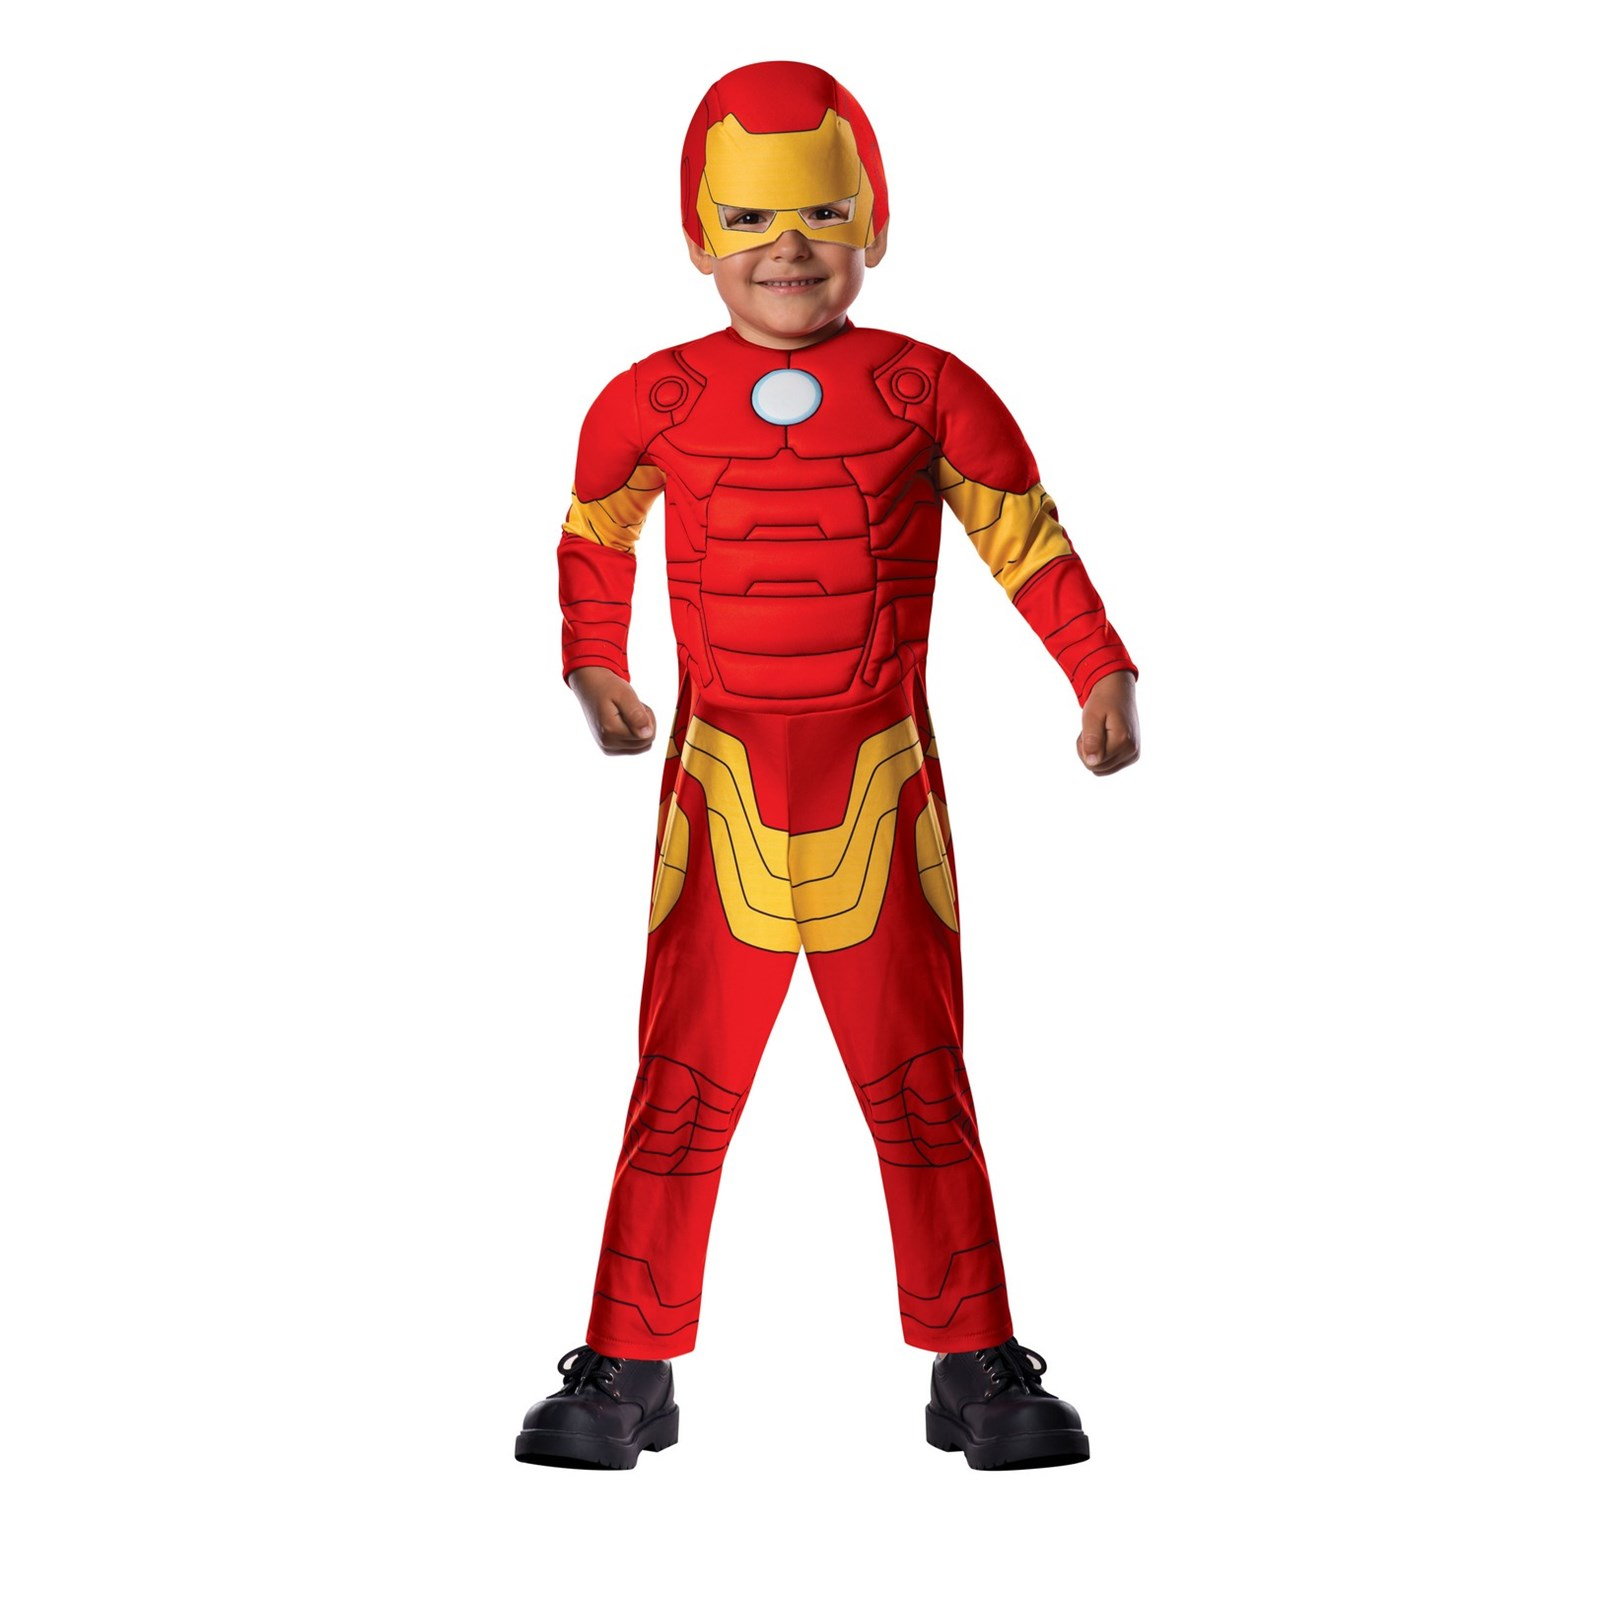 Halloween Iron Man Deluxe Infant/Toddler Costume